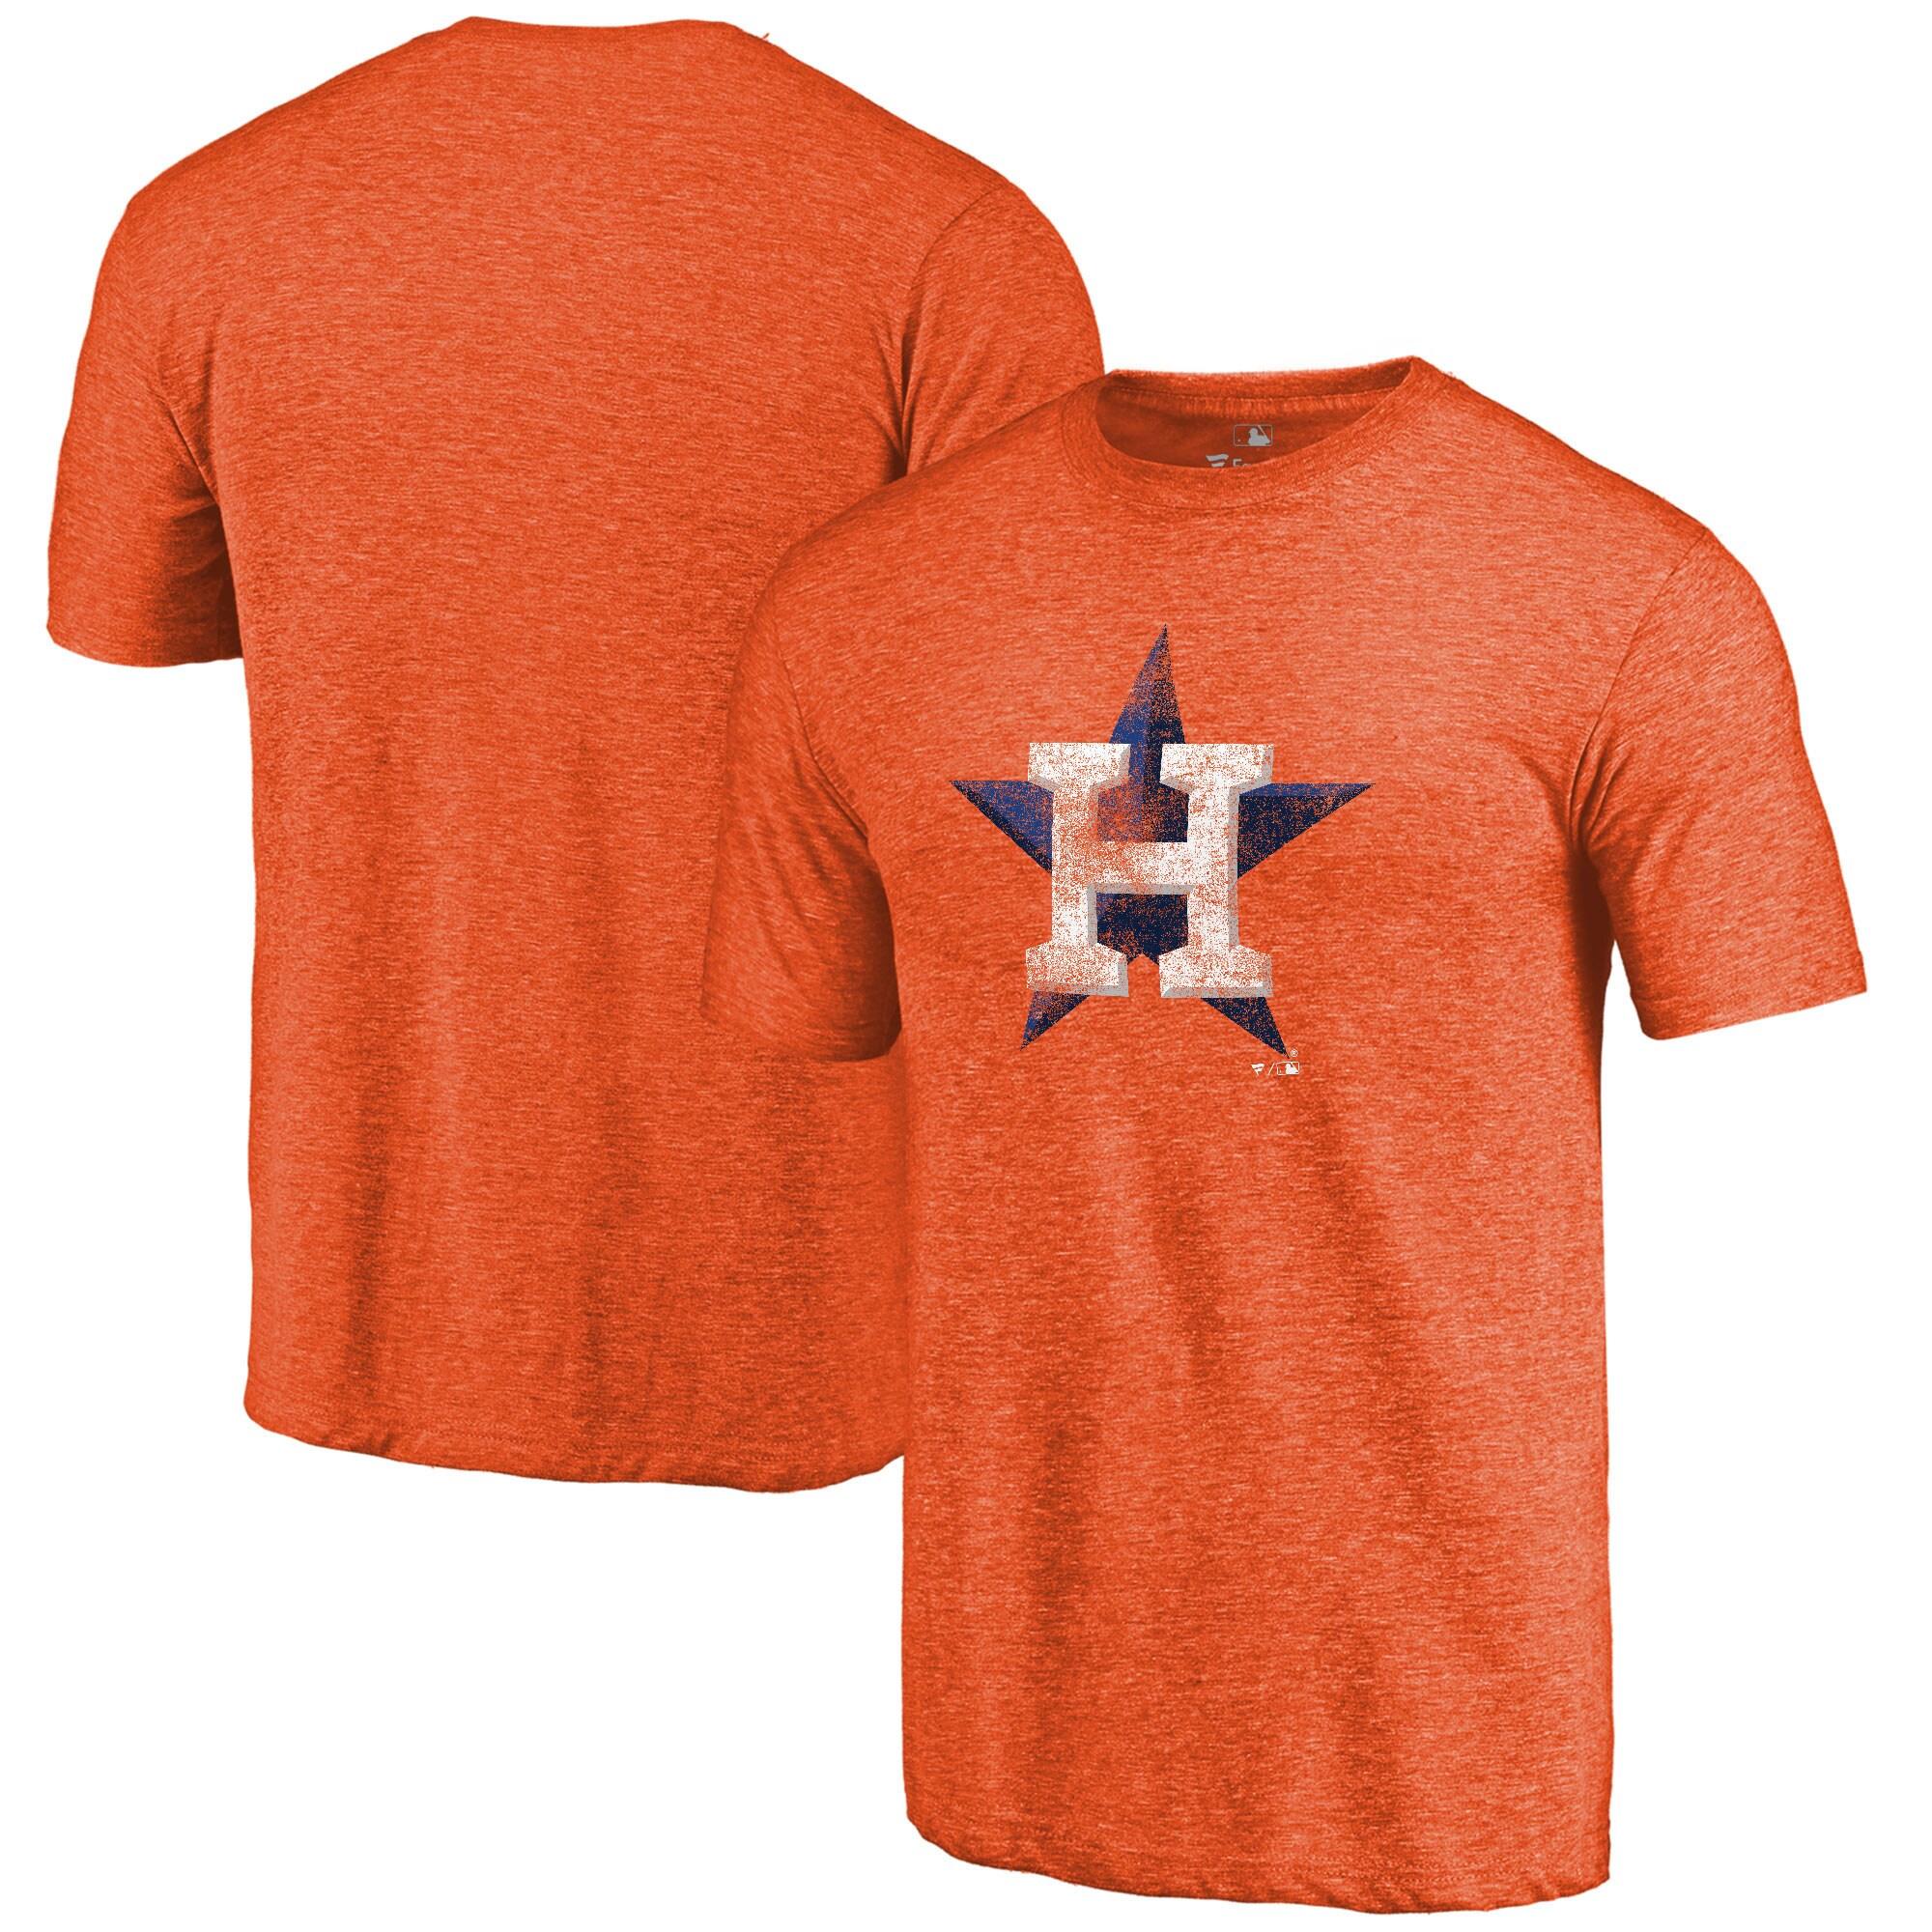 Houston Astros Distressed Team Tri-Blend T-Shirt - Heathered Orange